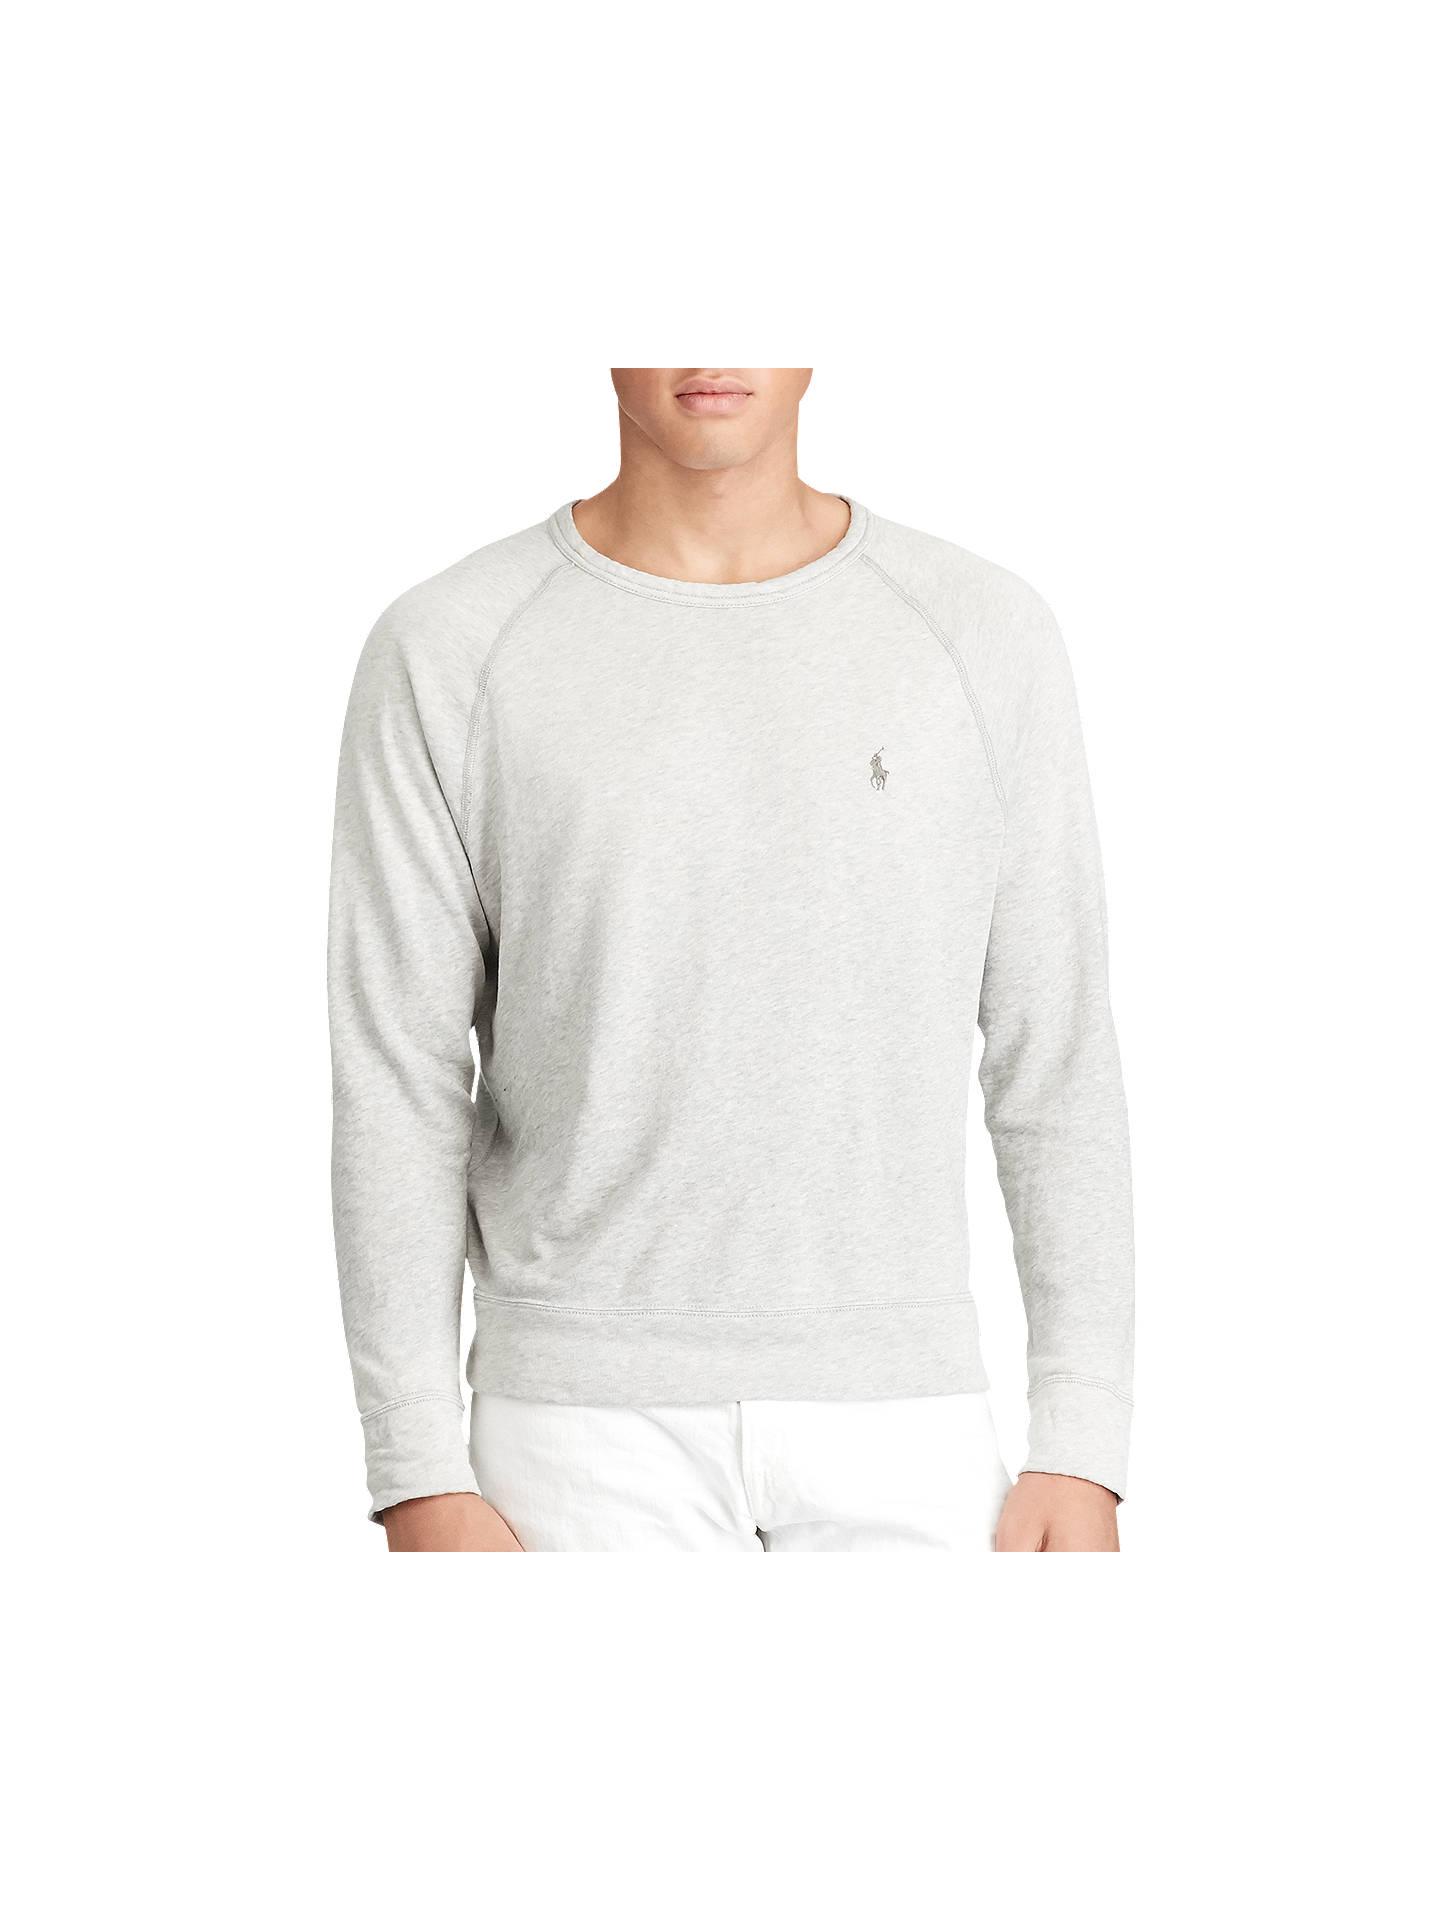 66490f1da Buy Polo Ralph Lauren French Terry Sweatshirt